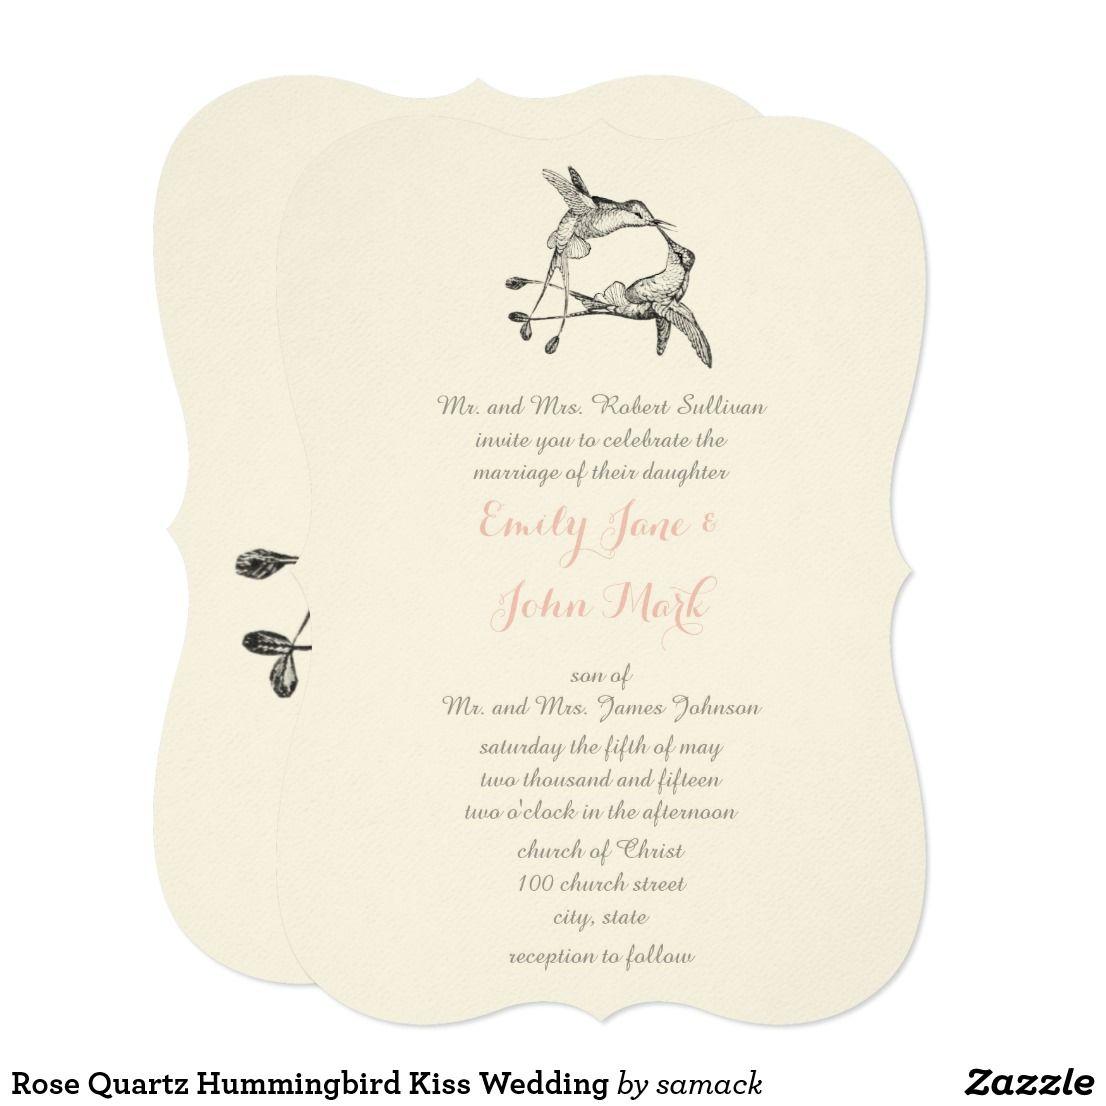 Rose Quartz Hummingbird Kiss Wedding Card | Wedding card, Favors and ...